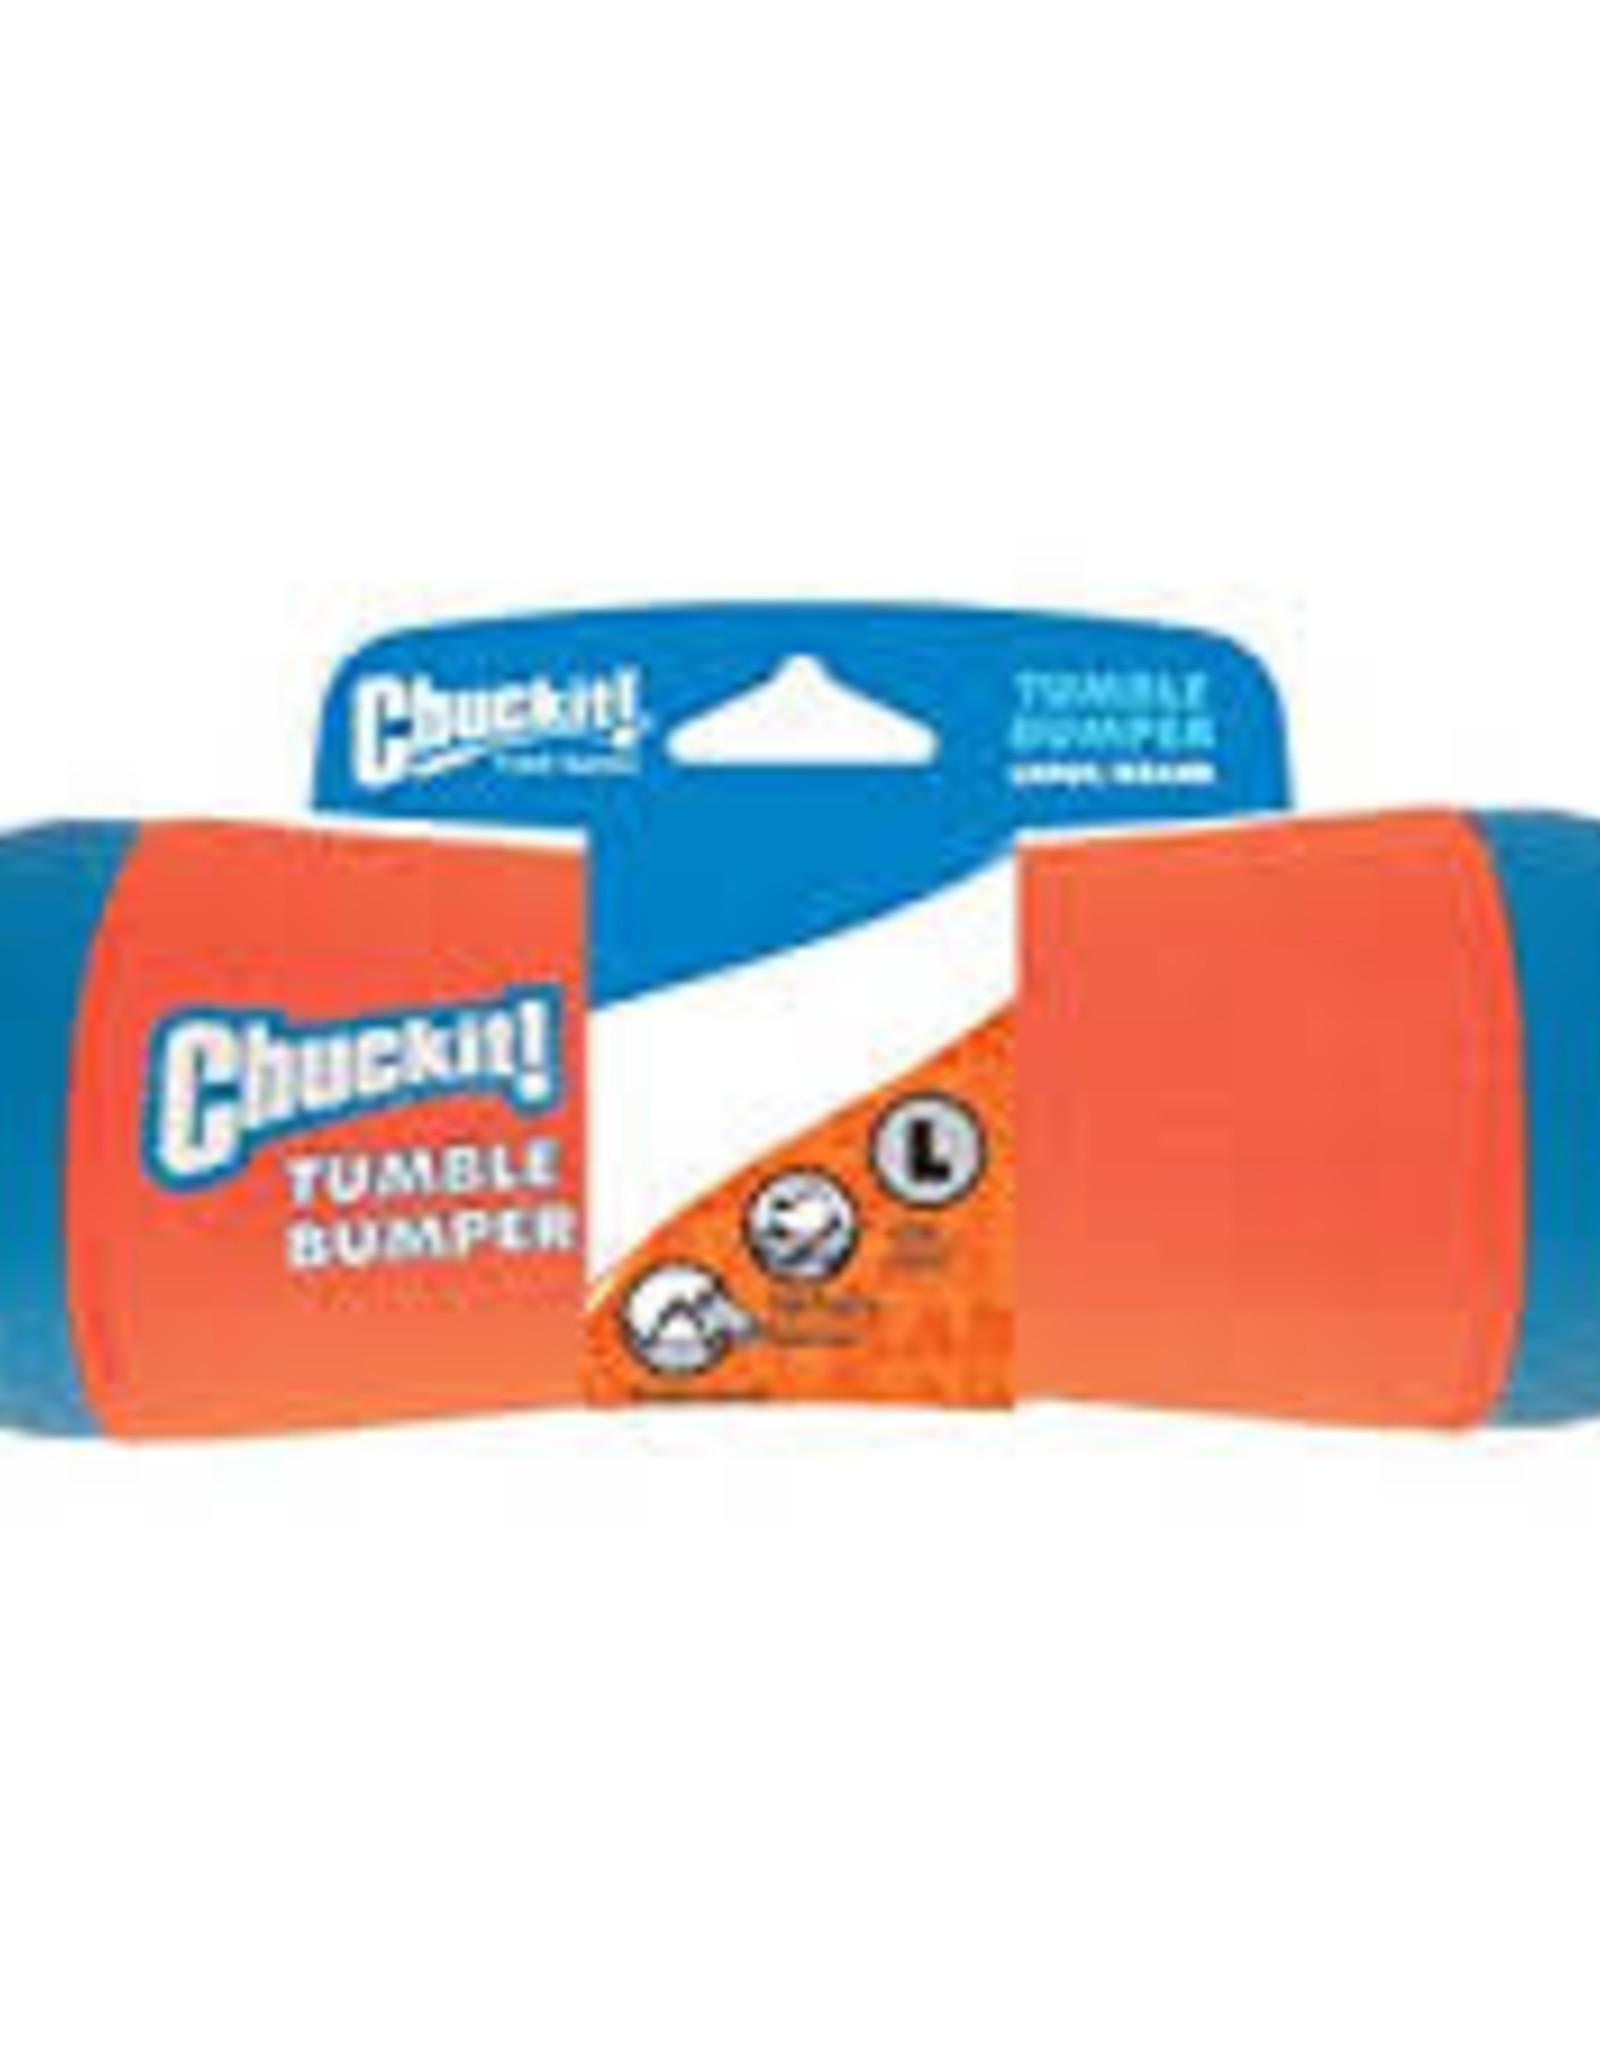 Chuck It Tumble Bumper Medium